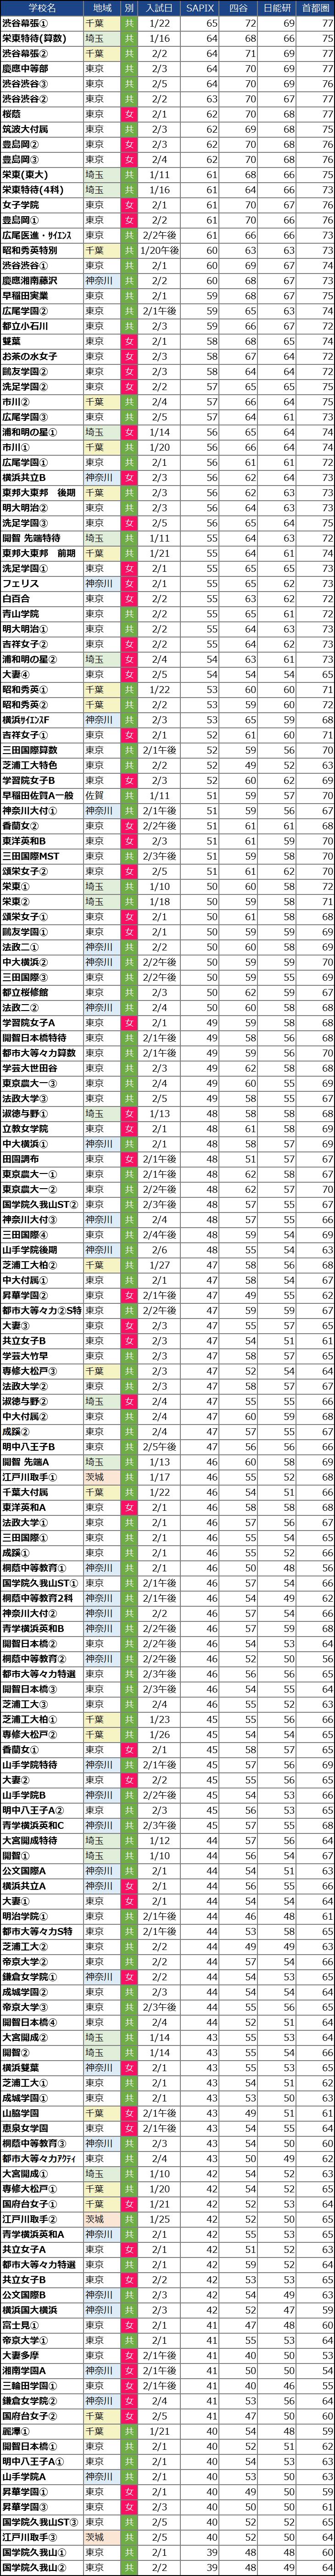 【中学受験2021】SAPIX・四谷大塚・日能研・首都模試の偏差値の違い(女子)